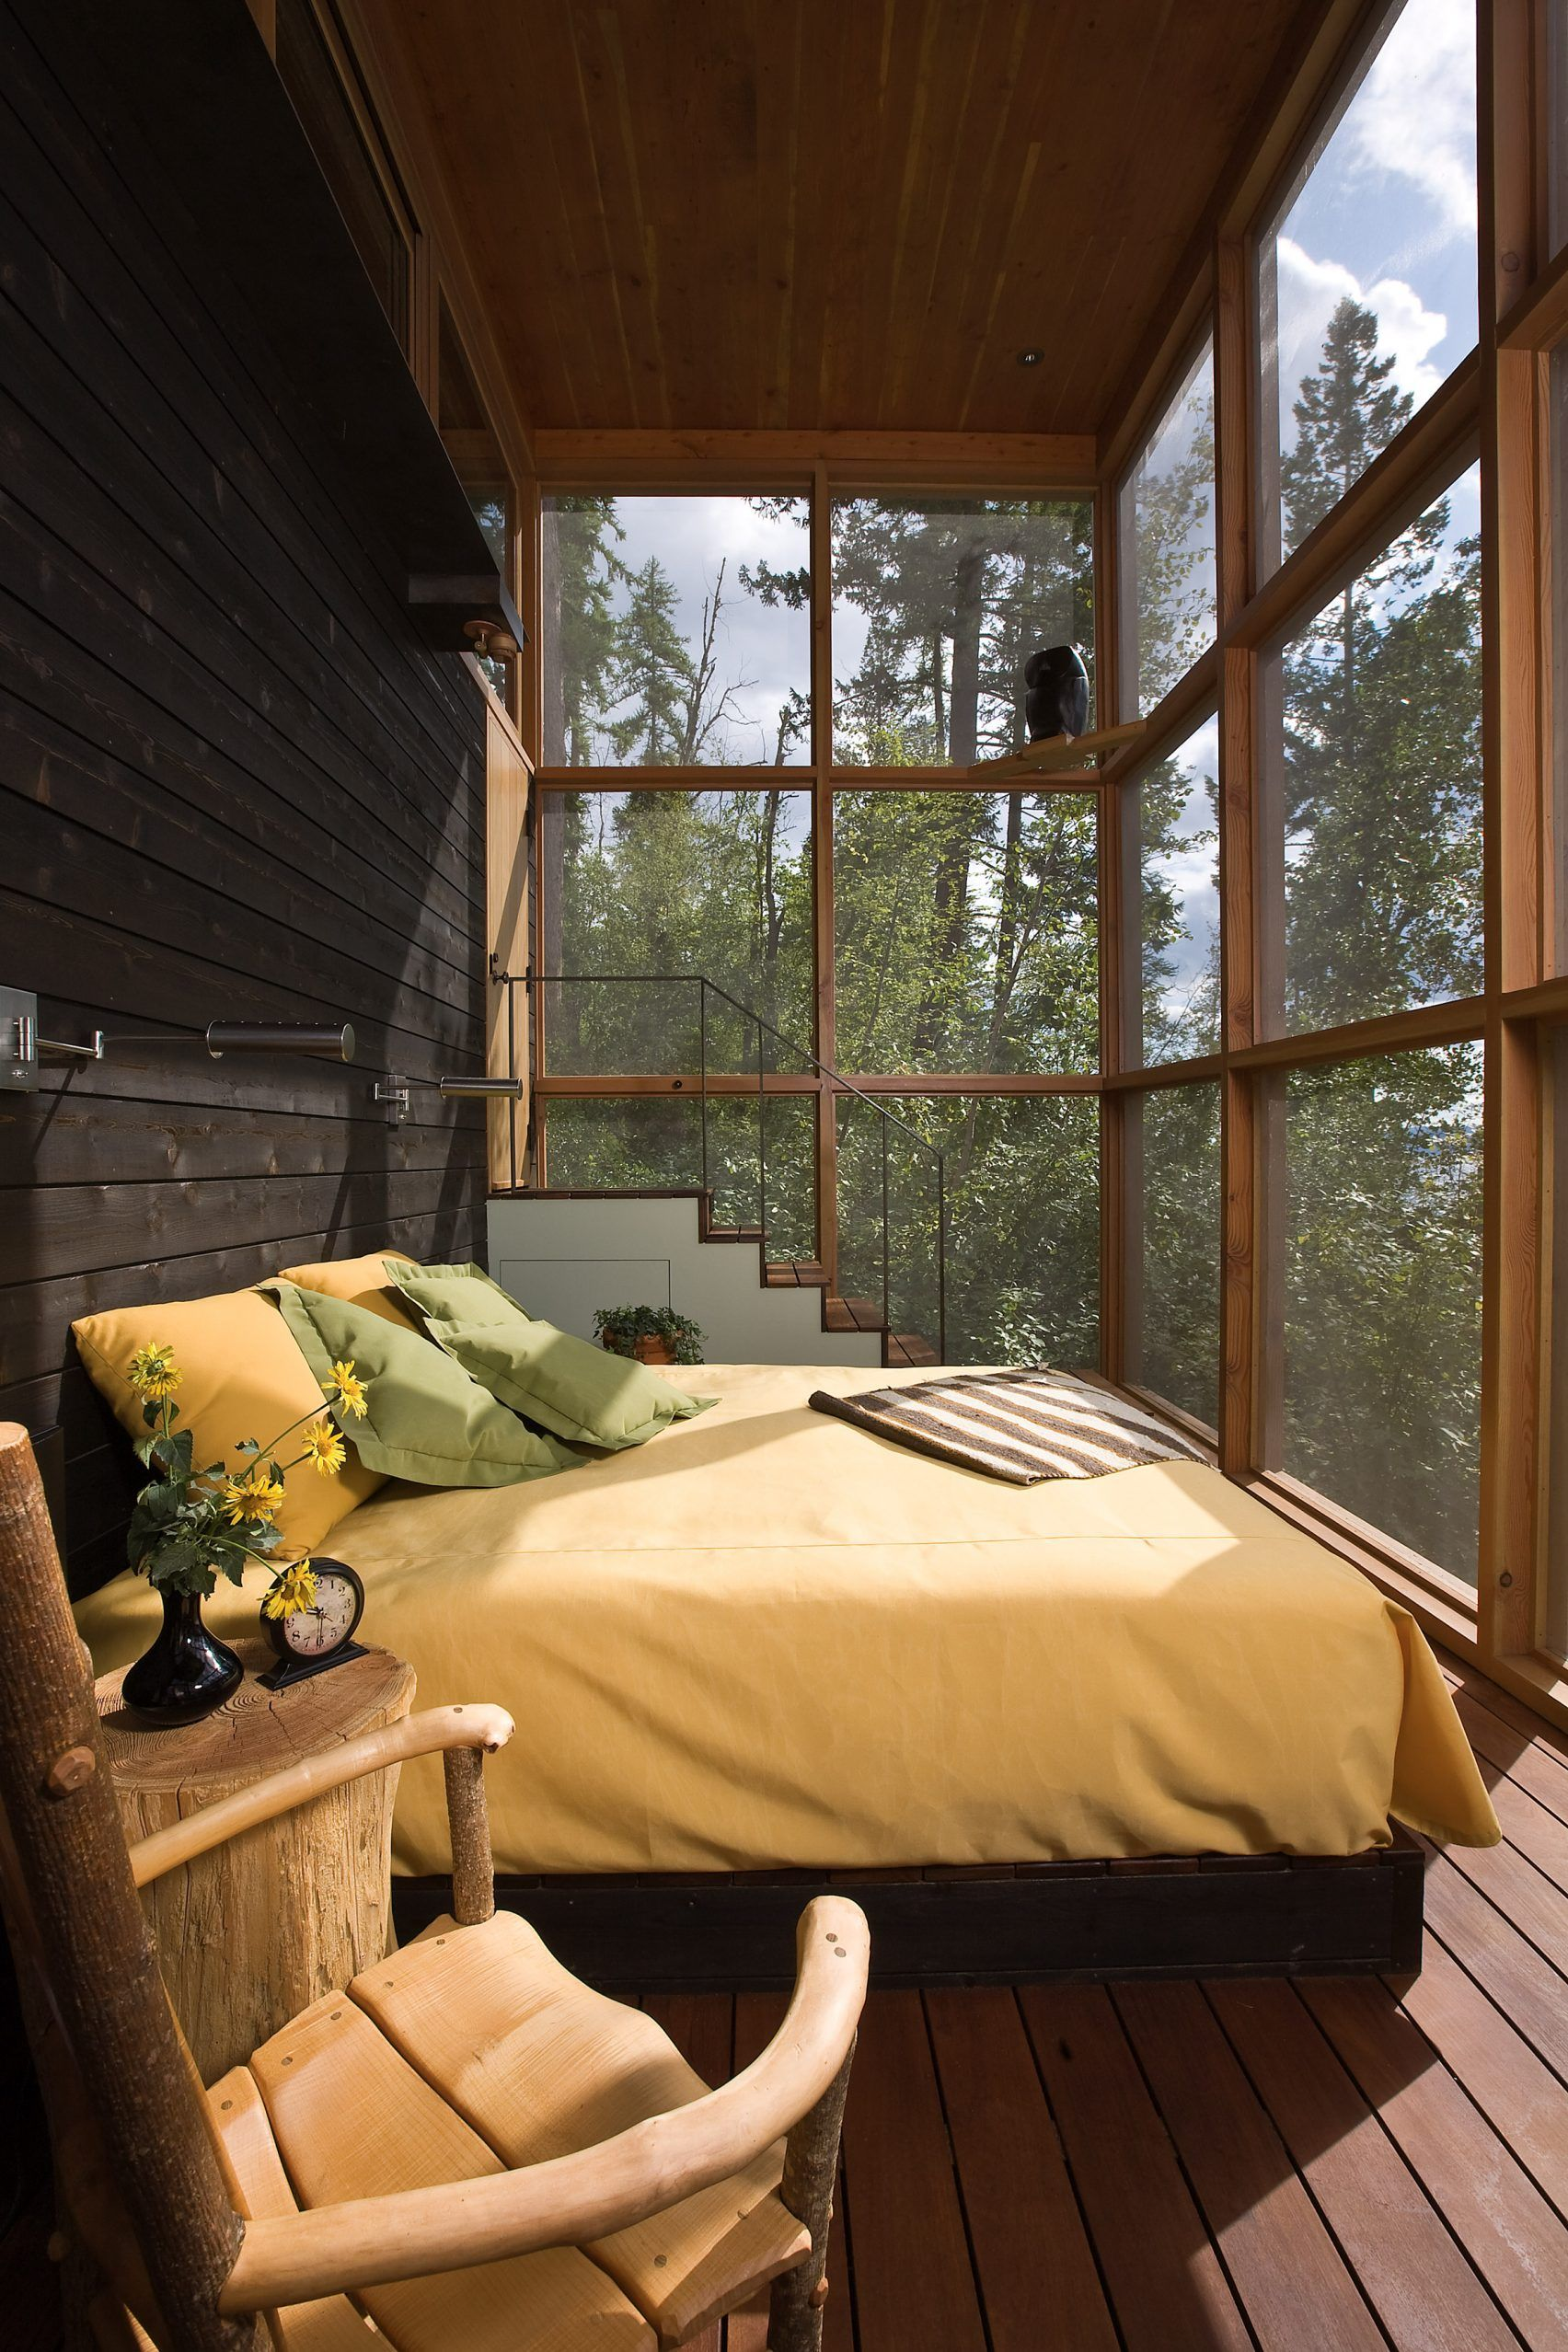 Photography art gray sweet home make interior decoration design ideas decor also rh pinterest